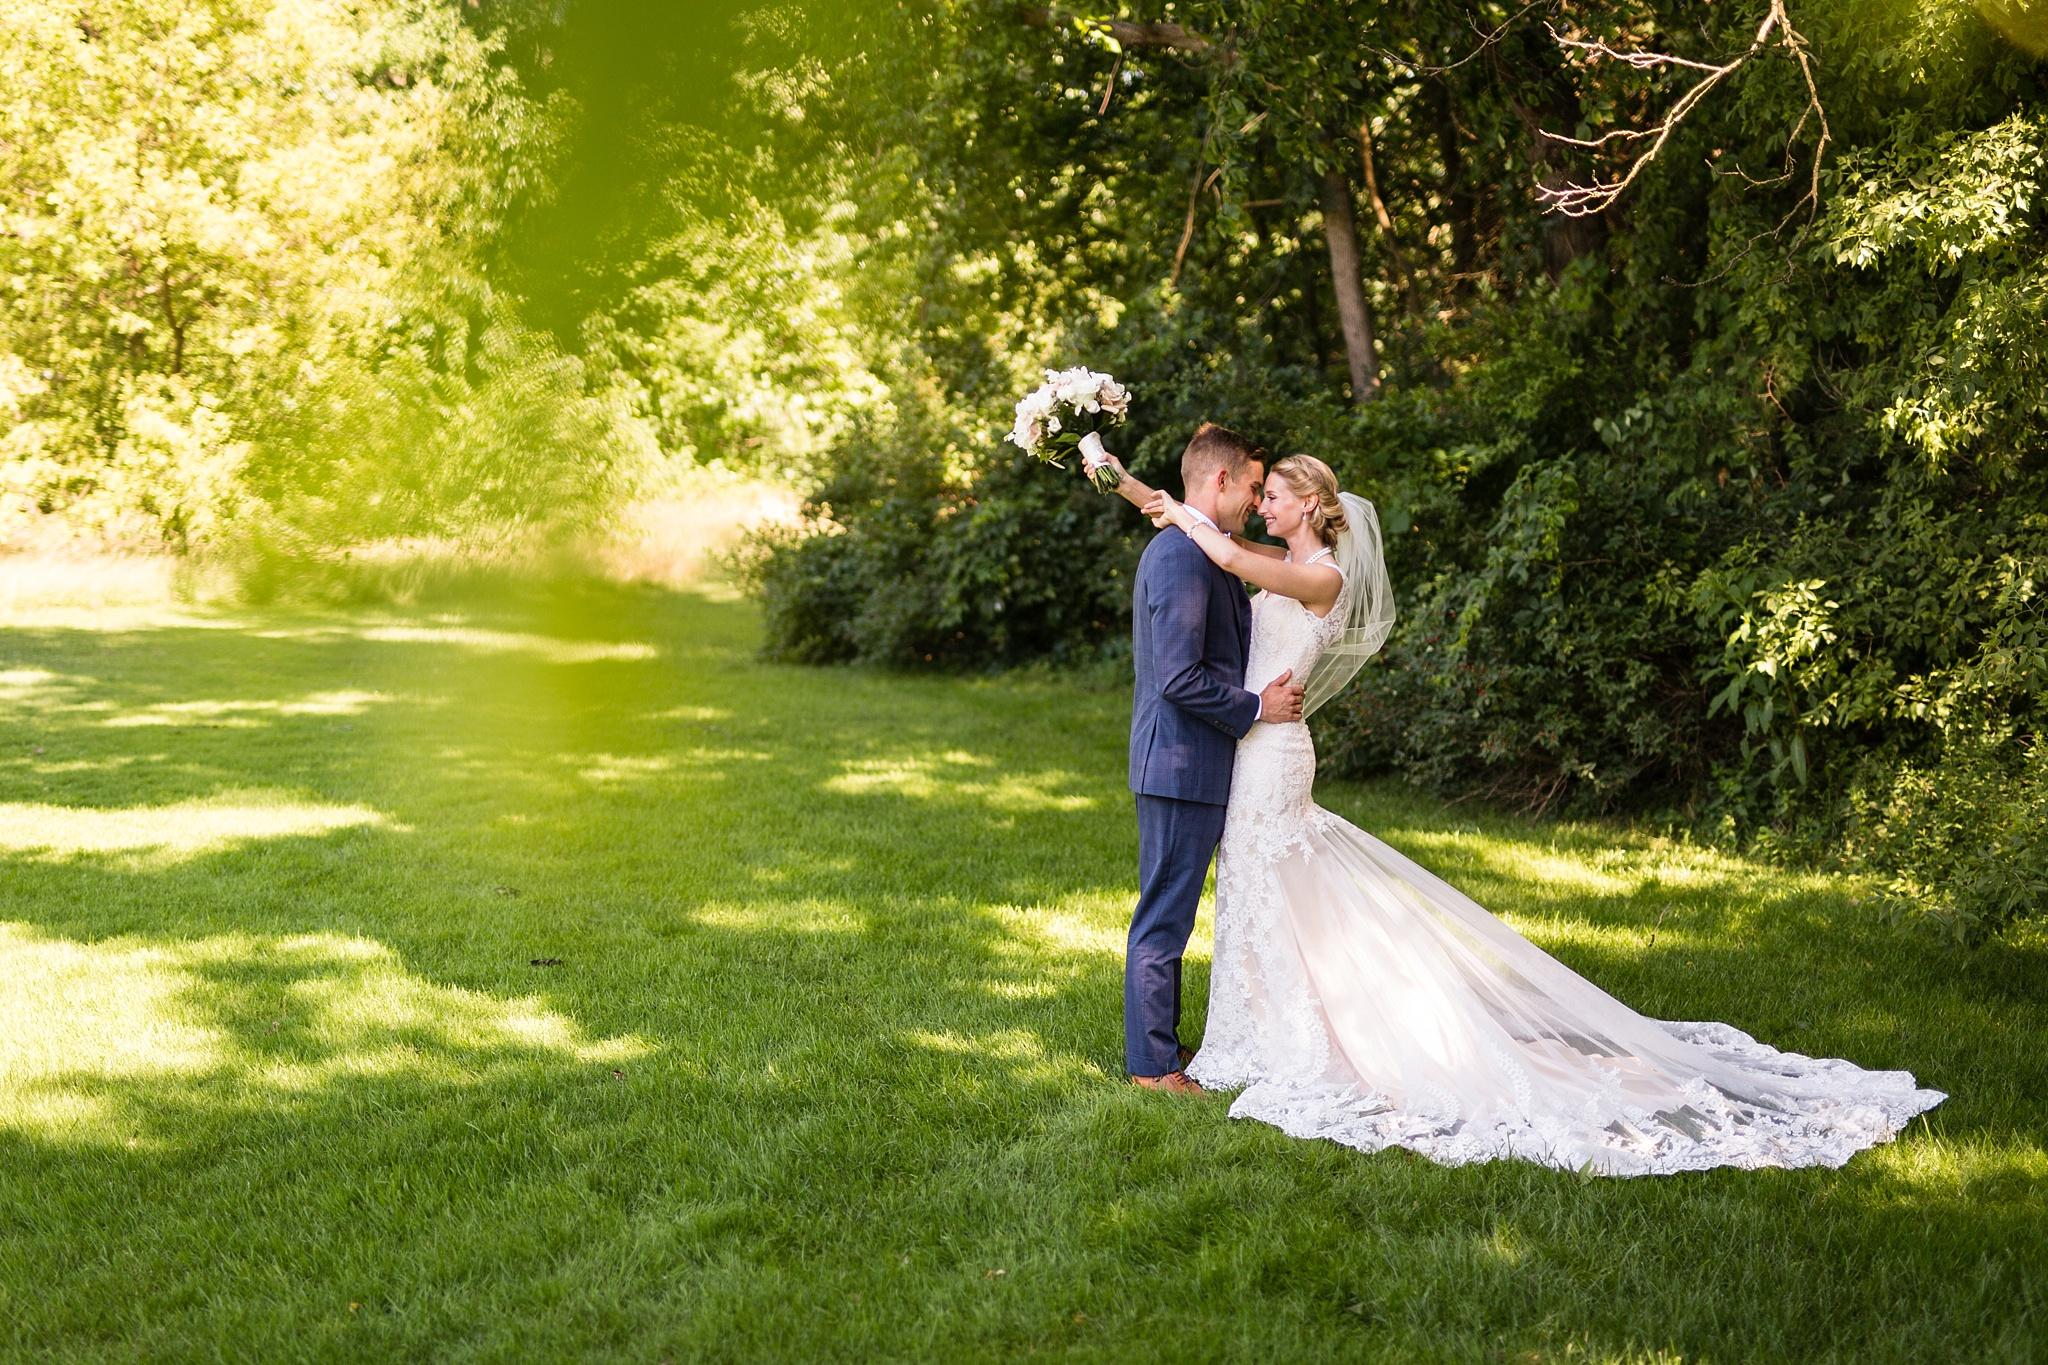 Becky_Cameron_Grand_Rapids_Blythefield Country_Club_Wedding024.JPG